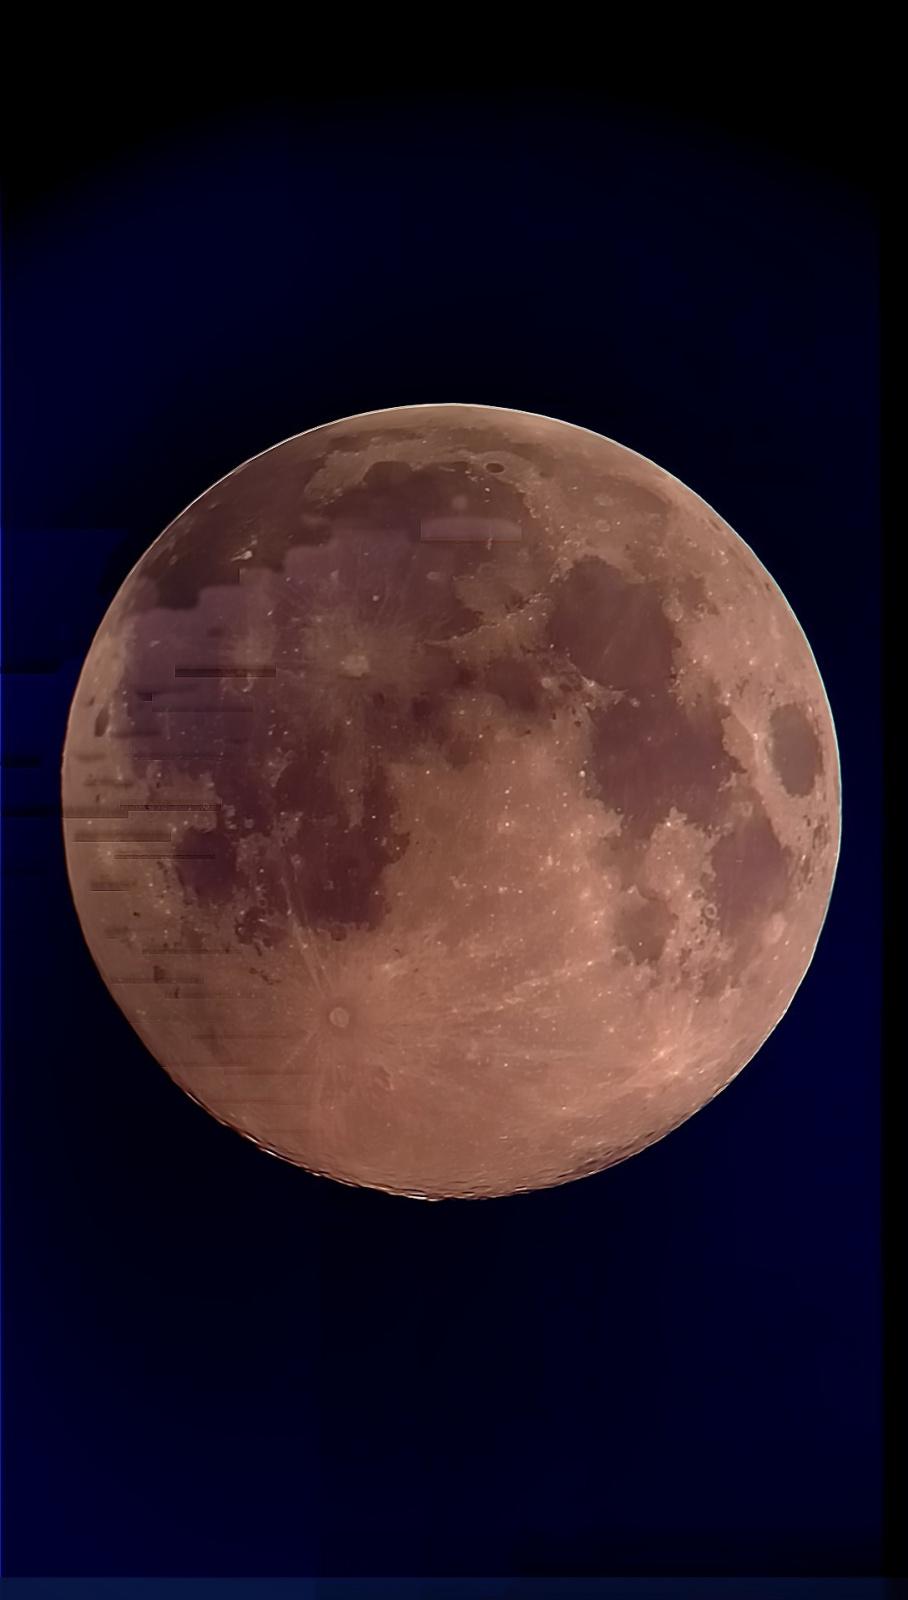 904936160_red_moon1.thumb.jpg.f2c865b4c626a75d4cbd47e730d69168.jpg